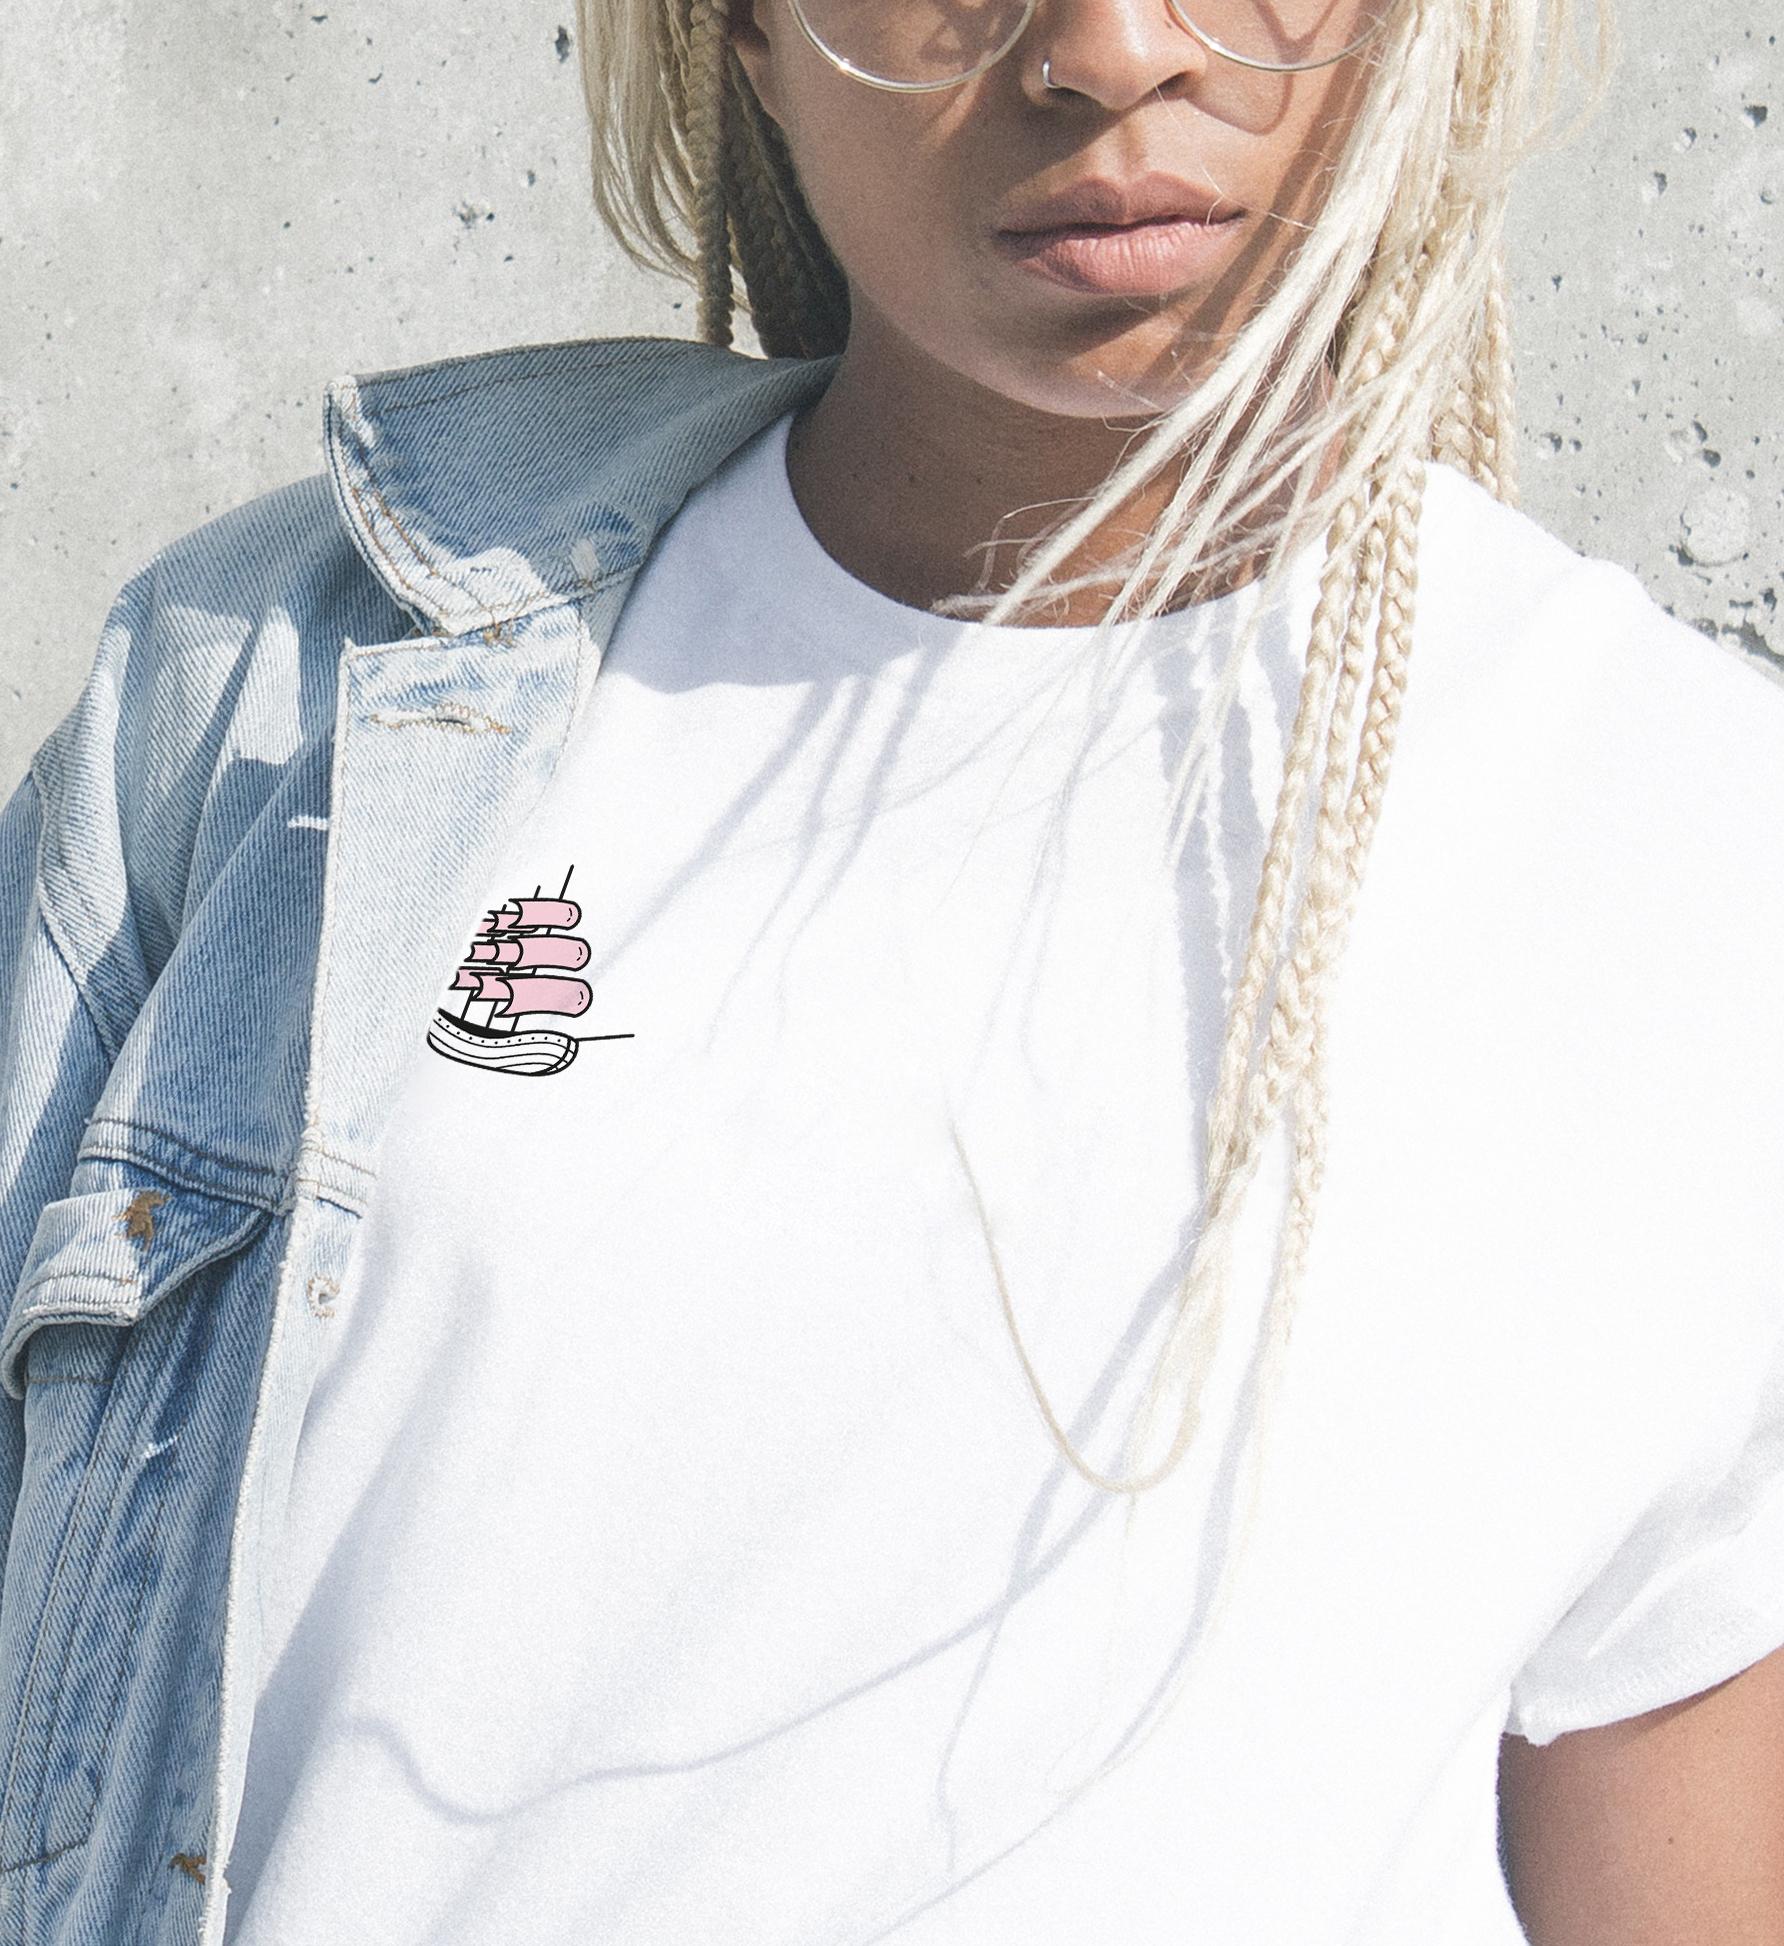 Lieferungs-Ikone T-Shirt